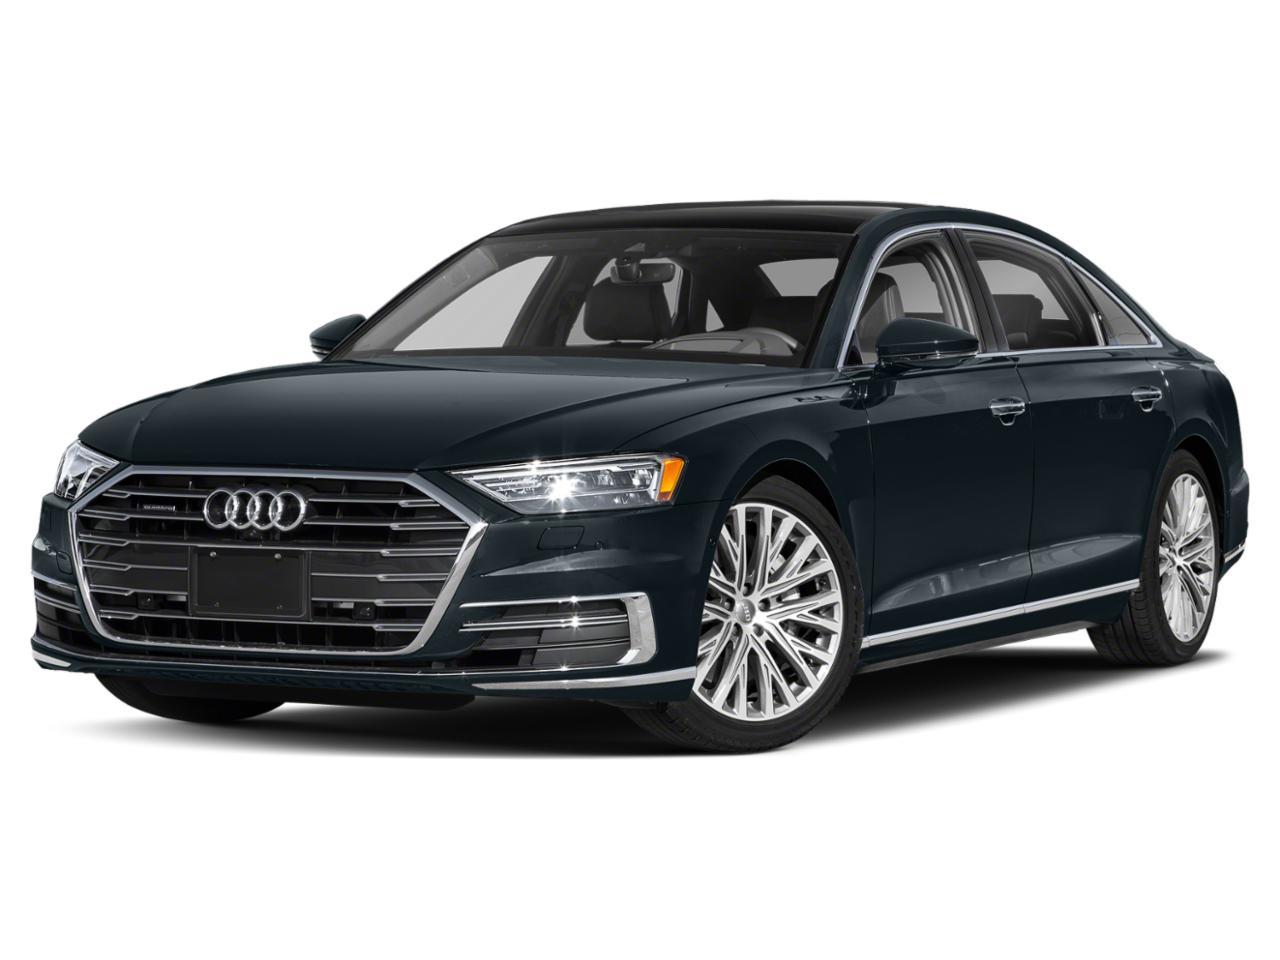 2021 Audi A8 L Vehicle Photo in HOUSTON, TX 77090